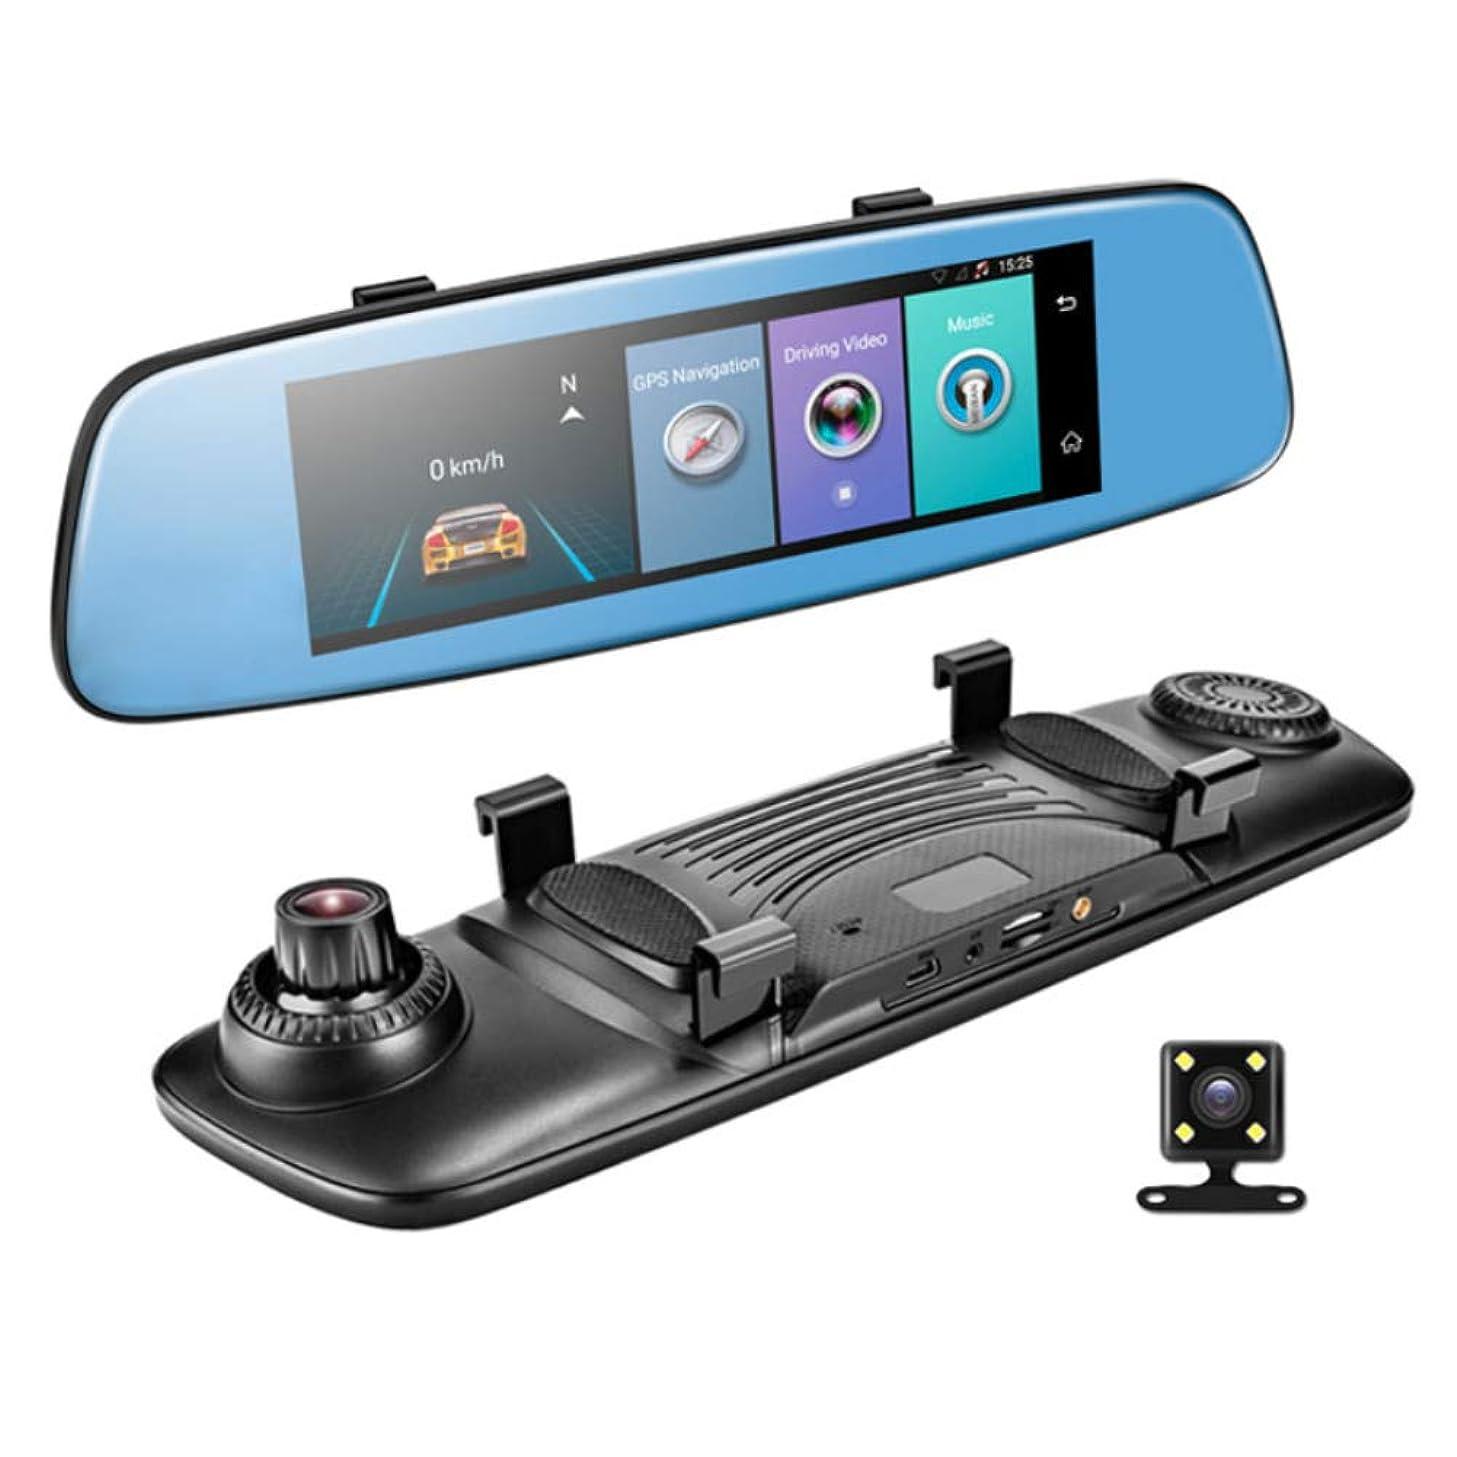 YUSHHO56T Smart Car DVR Car DVR Car DVR 4G 7.84 Inch Monitor Smart 1080P Dual Lens Car DVR Touch Rear View Mirror Camera - Black